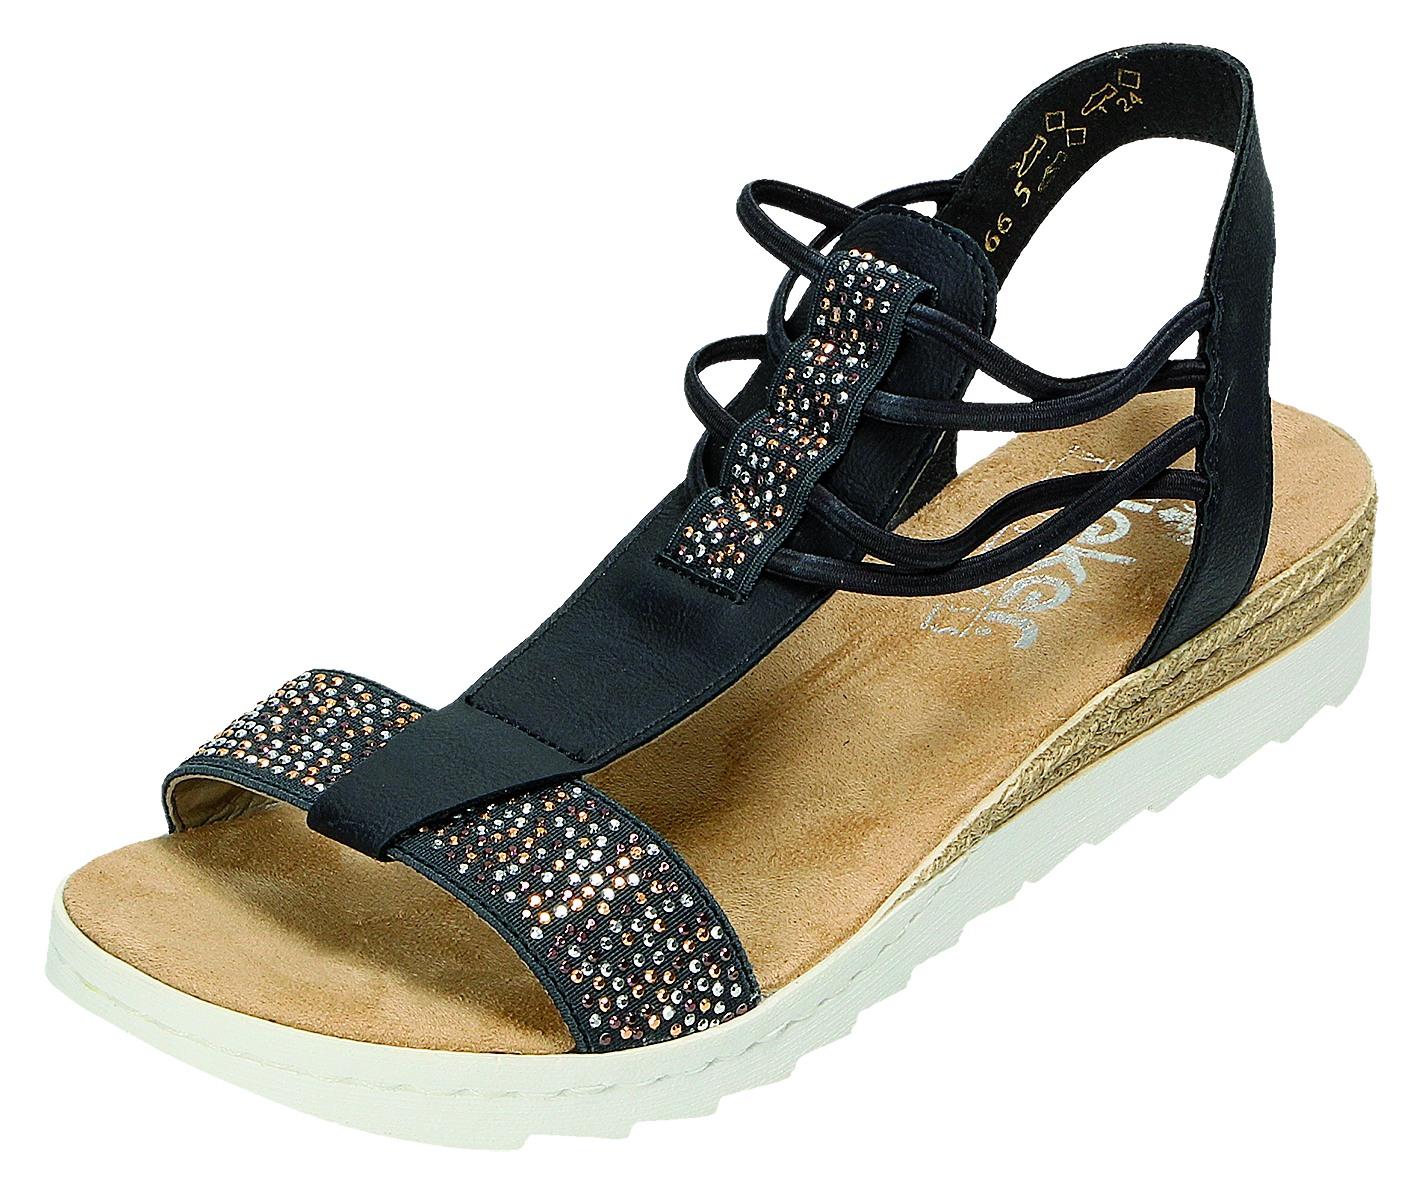 Rieker Damen Sandalen Pantolette Damen Sandalette Blau 63062 14 LAKE | eBay